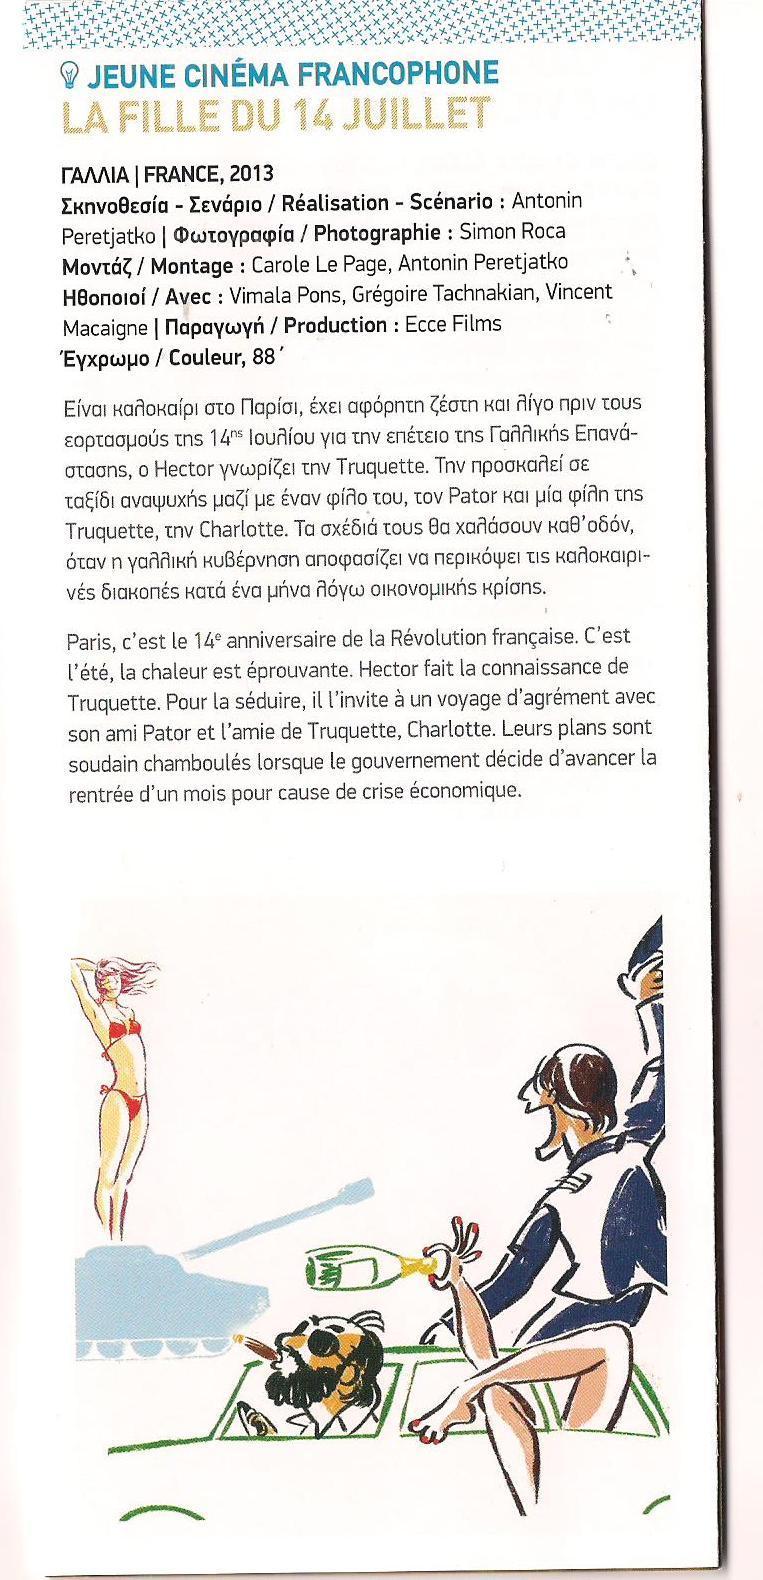 C:UserschristinaDesktopΓαλλικός κινηματογράφοςLa fille du 14 juillet (Δευτέρα 16.03 ώρα 21.00).jpg